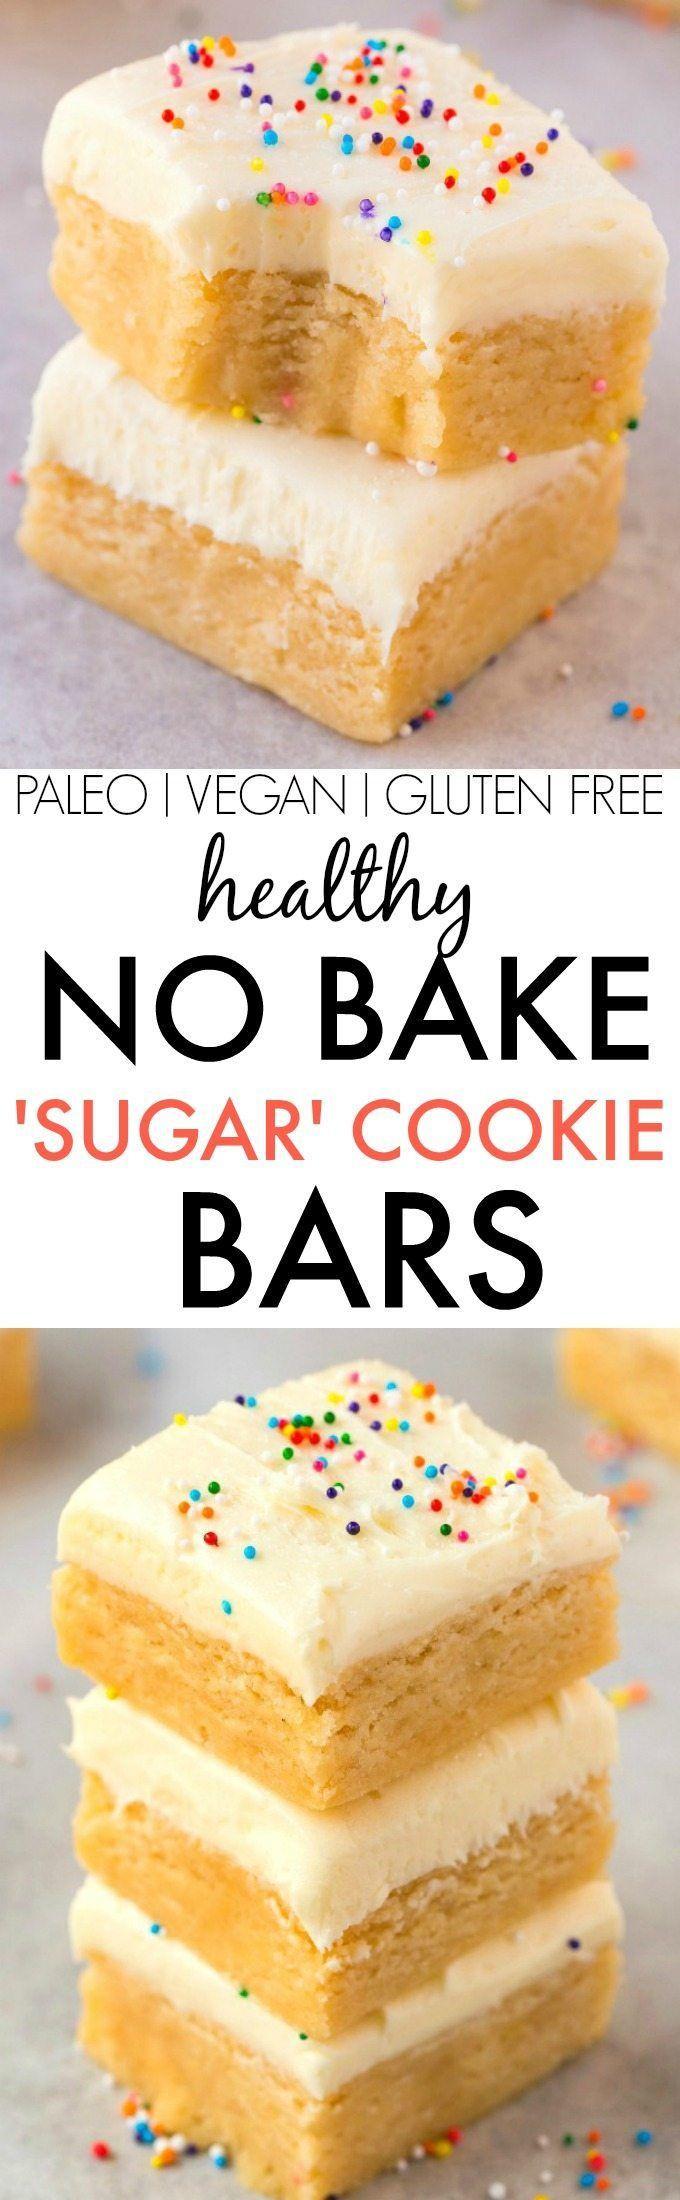 Healthy No Bake Cookies Sugar Free  No Bake Sugar Cookie Bars V GF Paleo Secretly